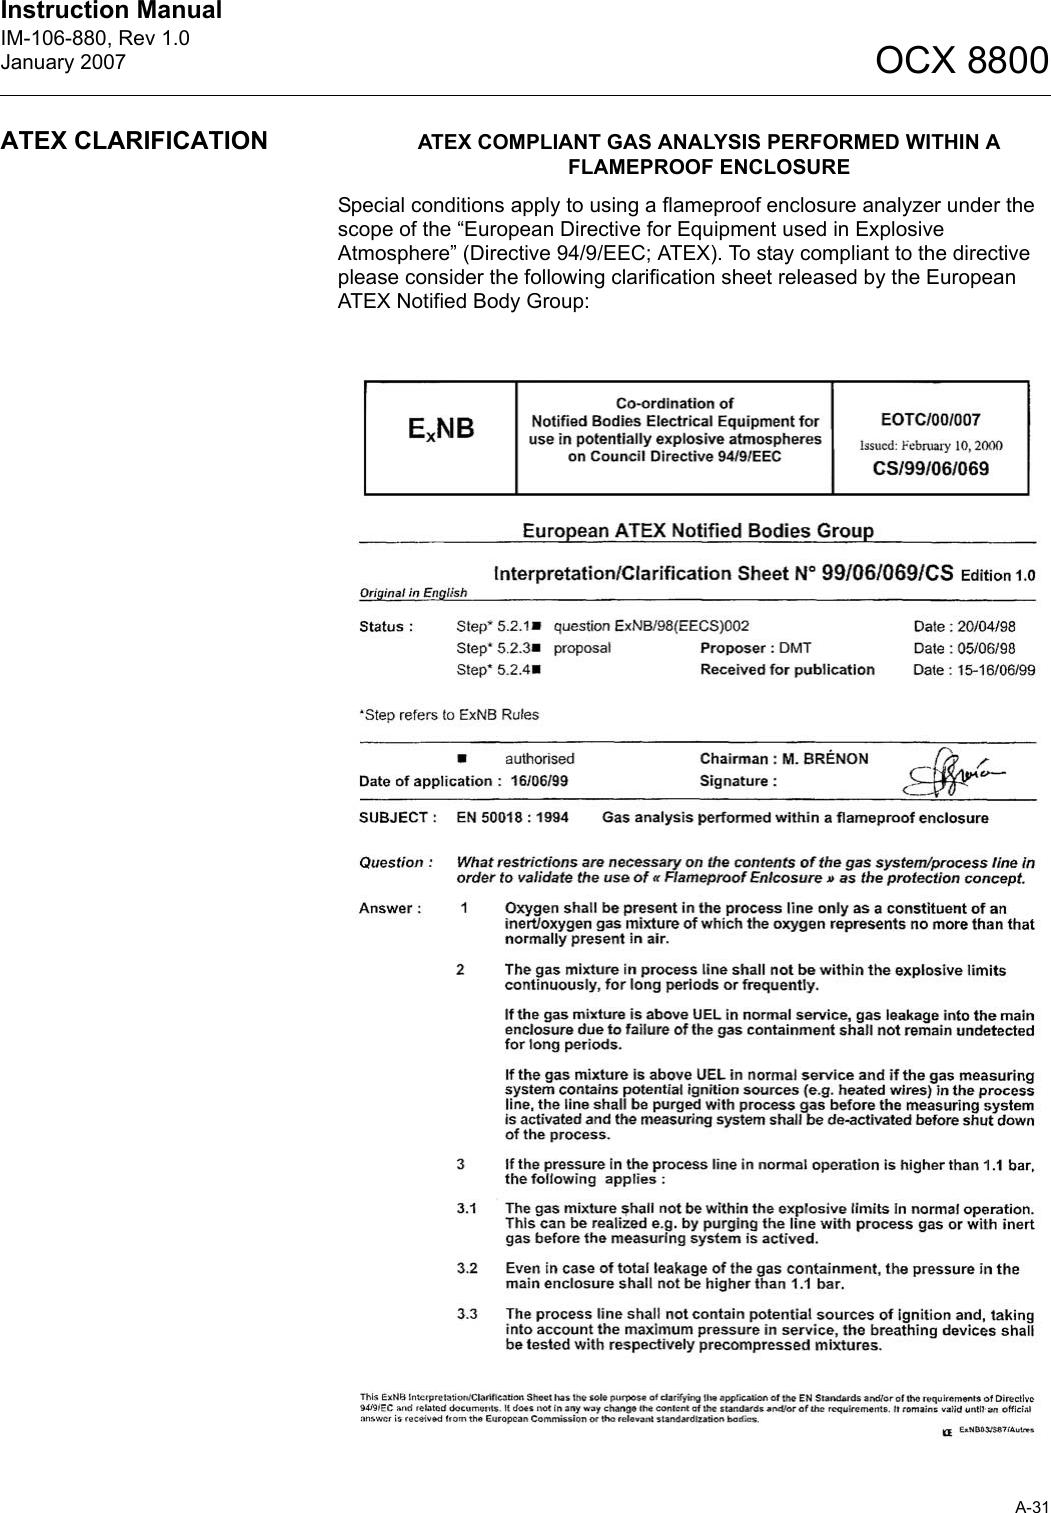 Emerson Rosemount Ocx 8800 Users Manual IM 106 880 LOI INT